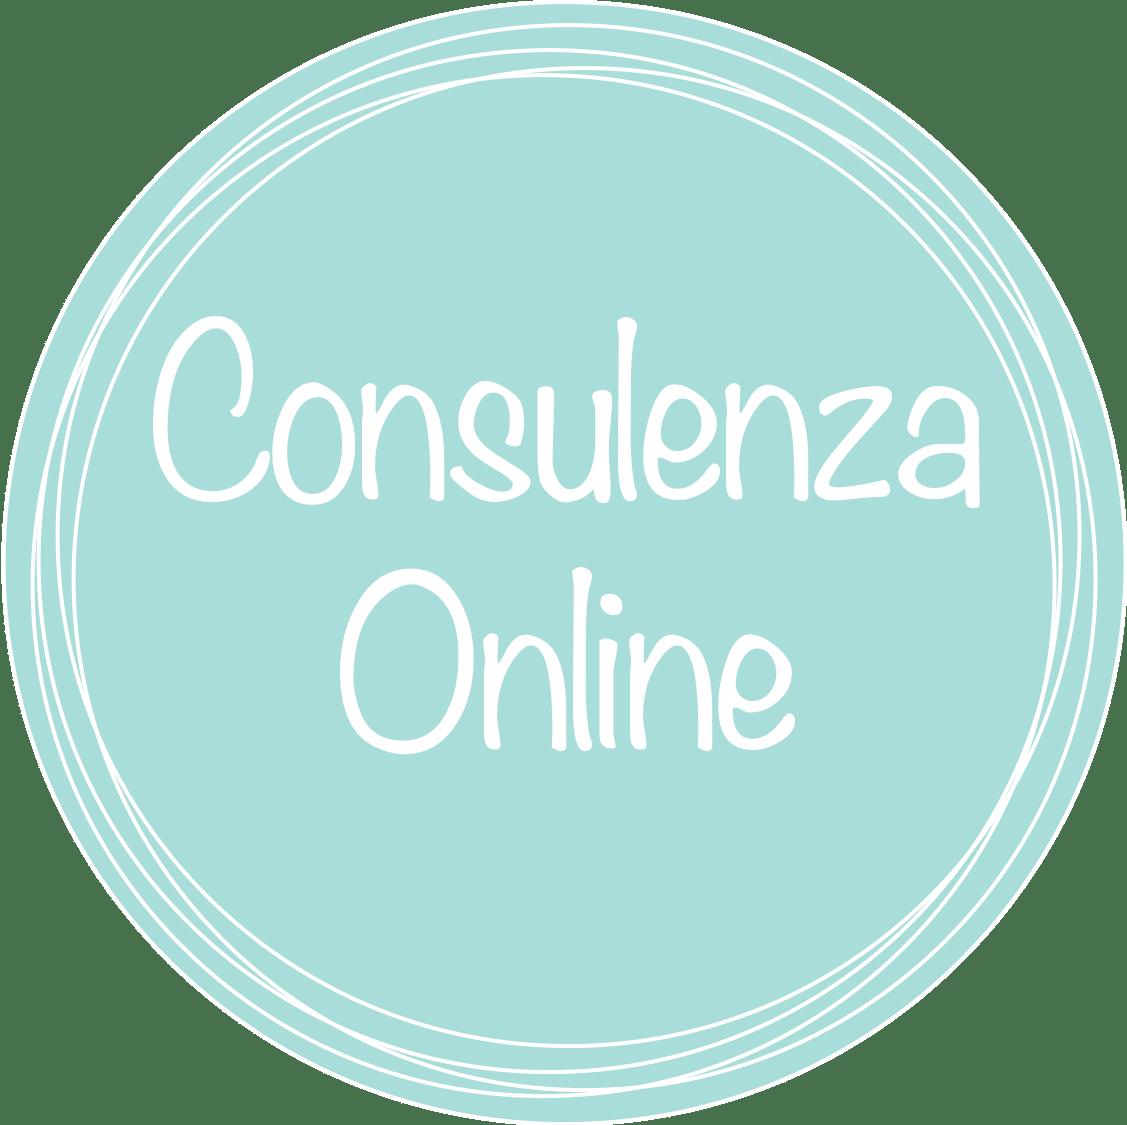 consulenza online tettologa